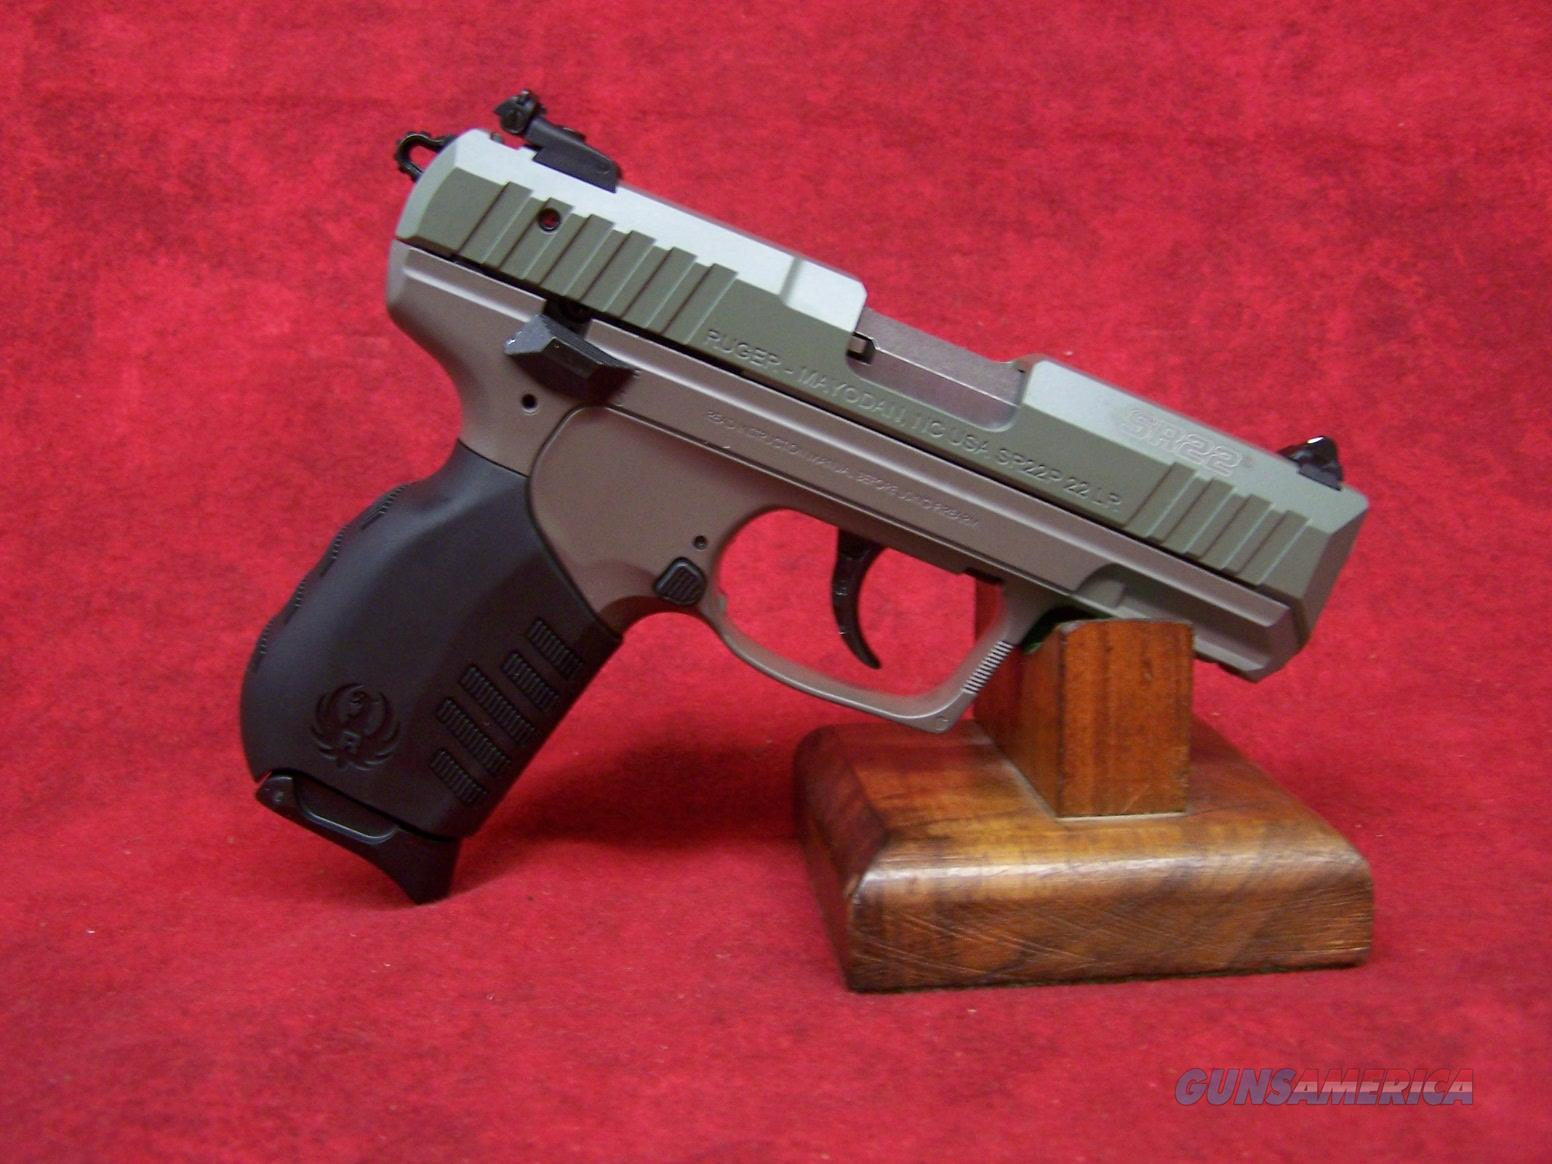 "Ruger SR22P .22LR TALO Jungle Green Slide FDE Frame Cerakote 3.5"" Barrel (03641)  Guns > Pistols > Ruger Semi-Auto Pistols > SR Family > SR22"